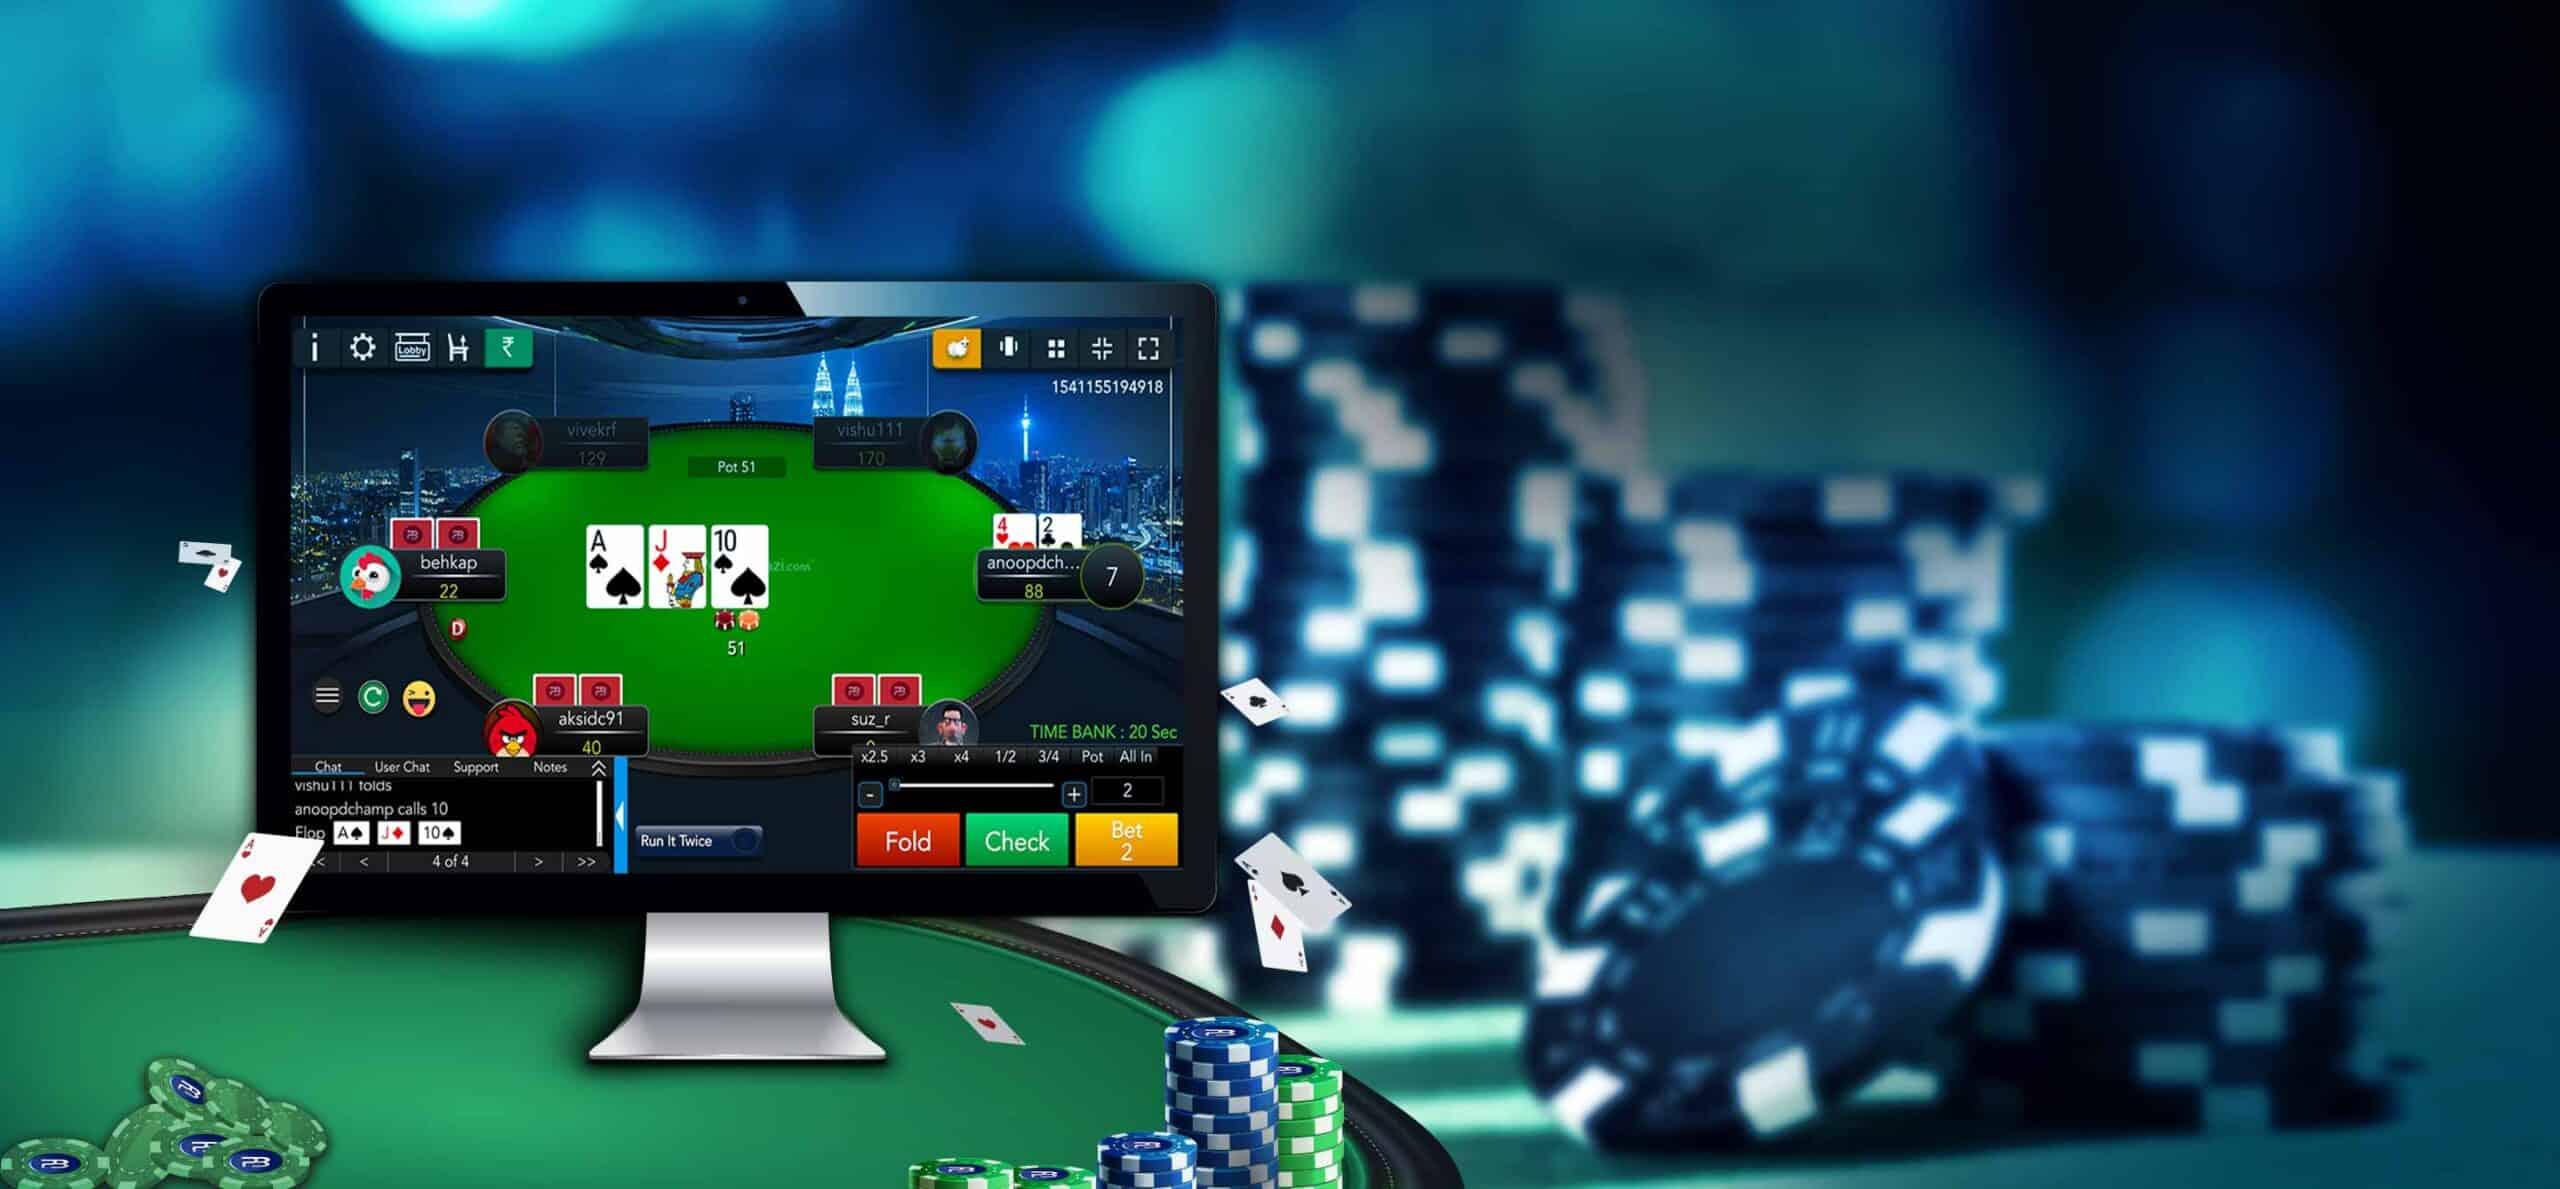 Poker Online Gratis in Multiplayer: dove giocare